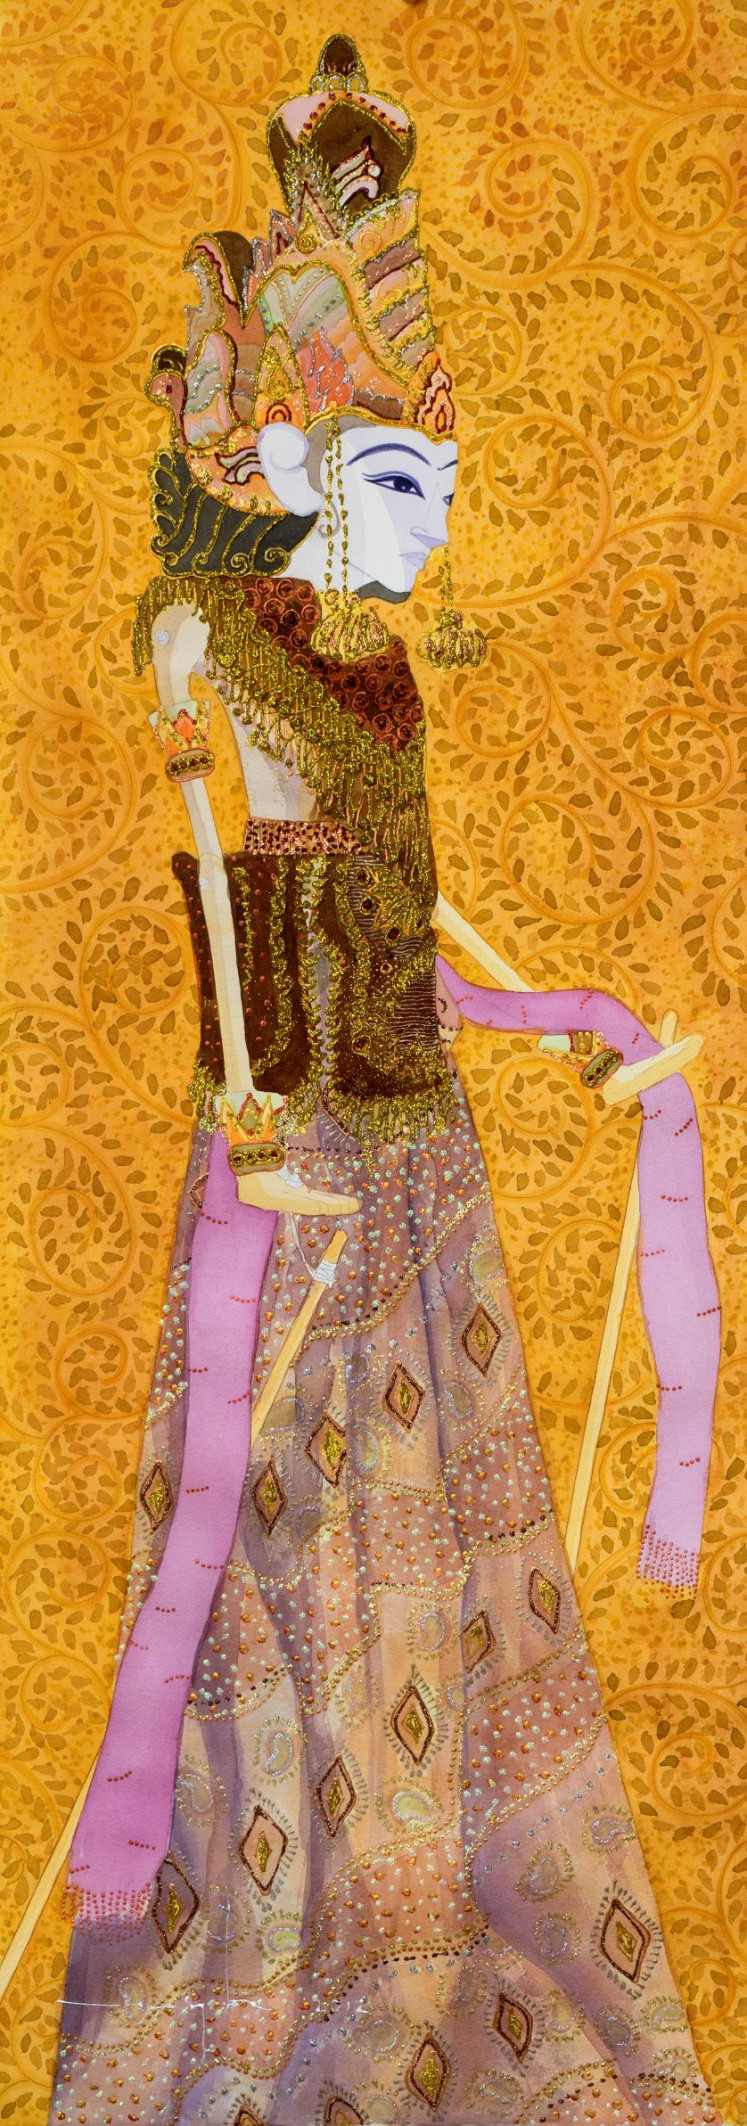 'Legend of Rama Shinta' by Sasya Tranggono